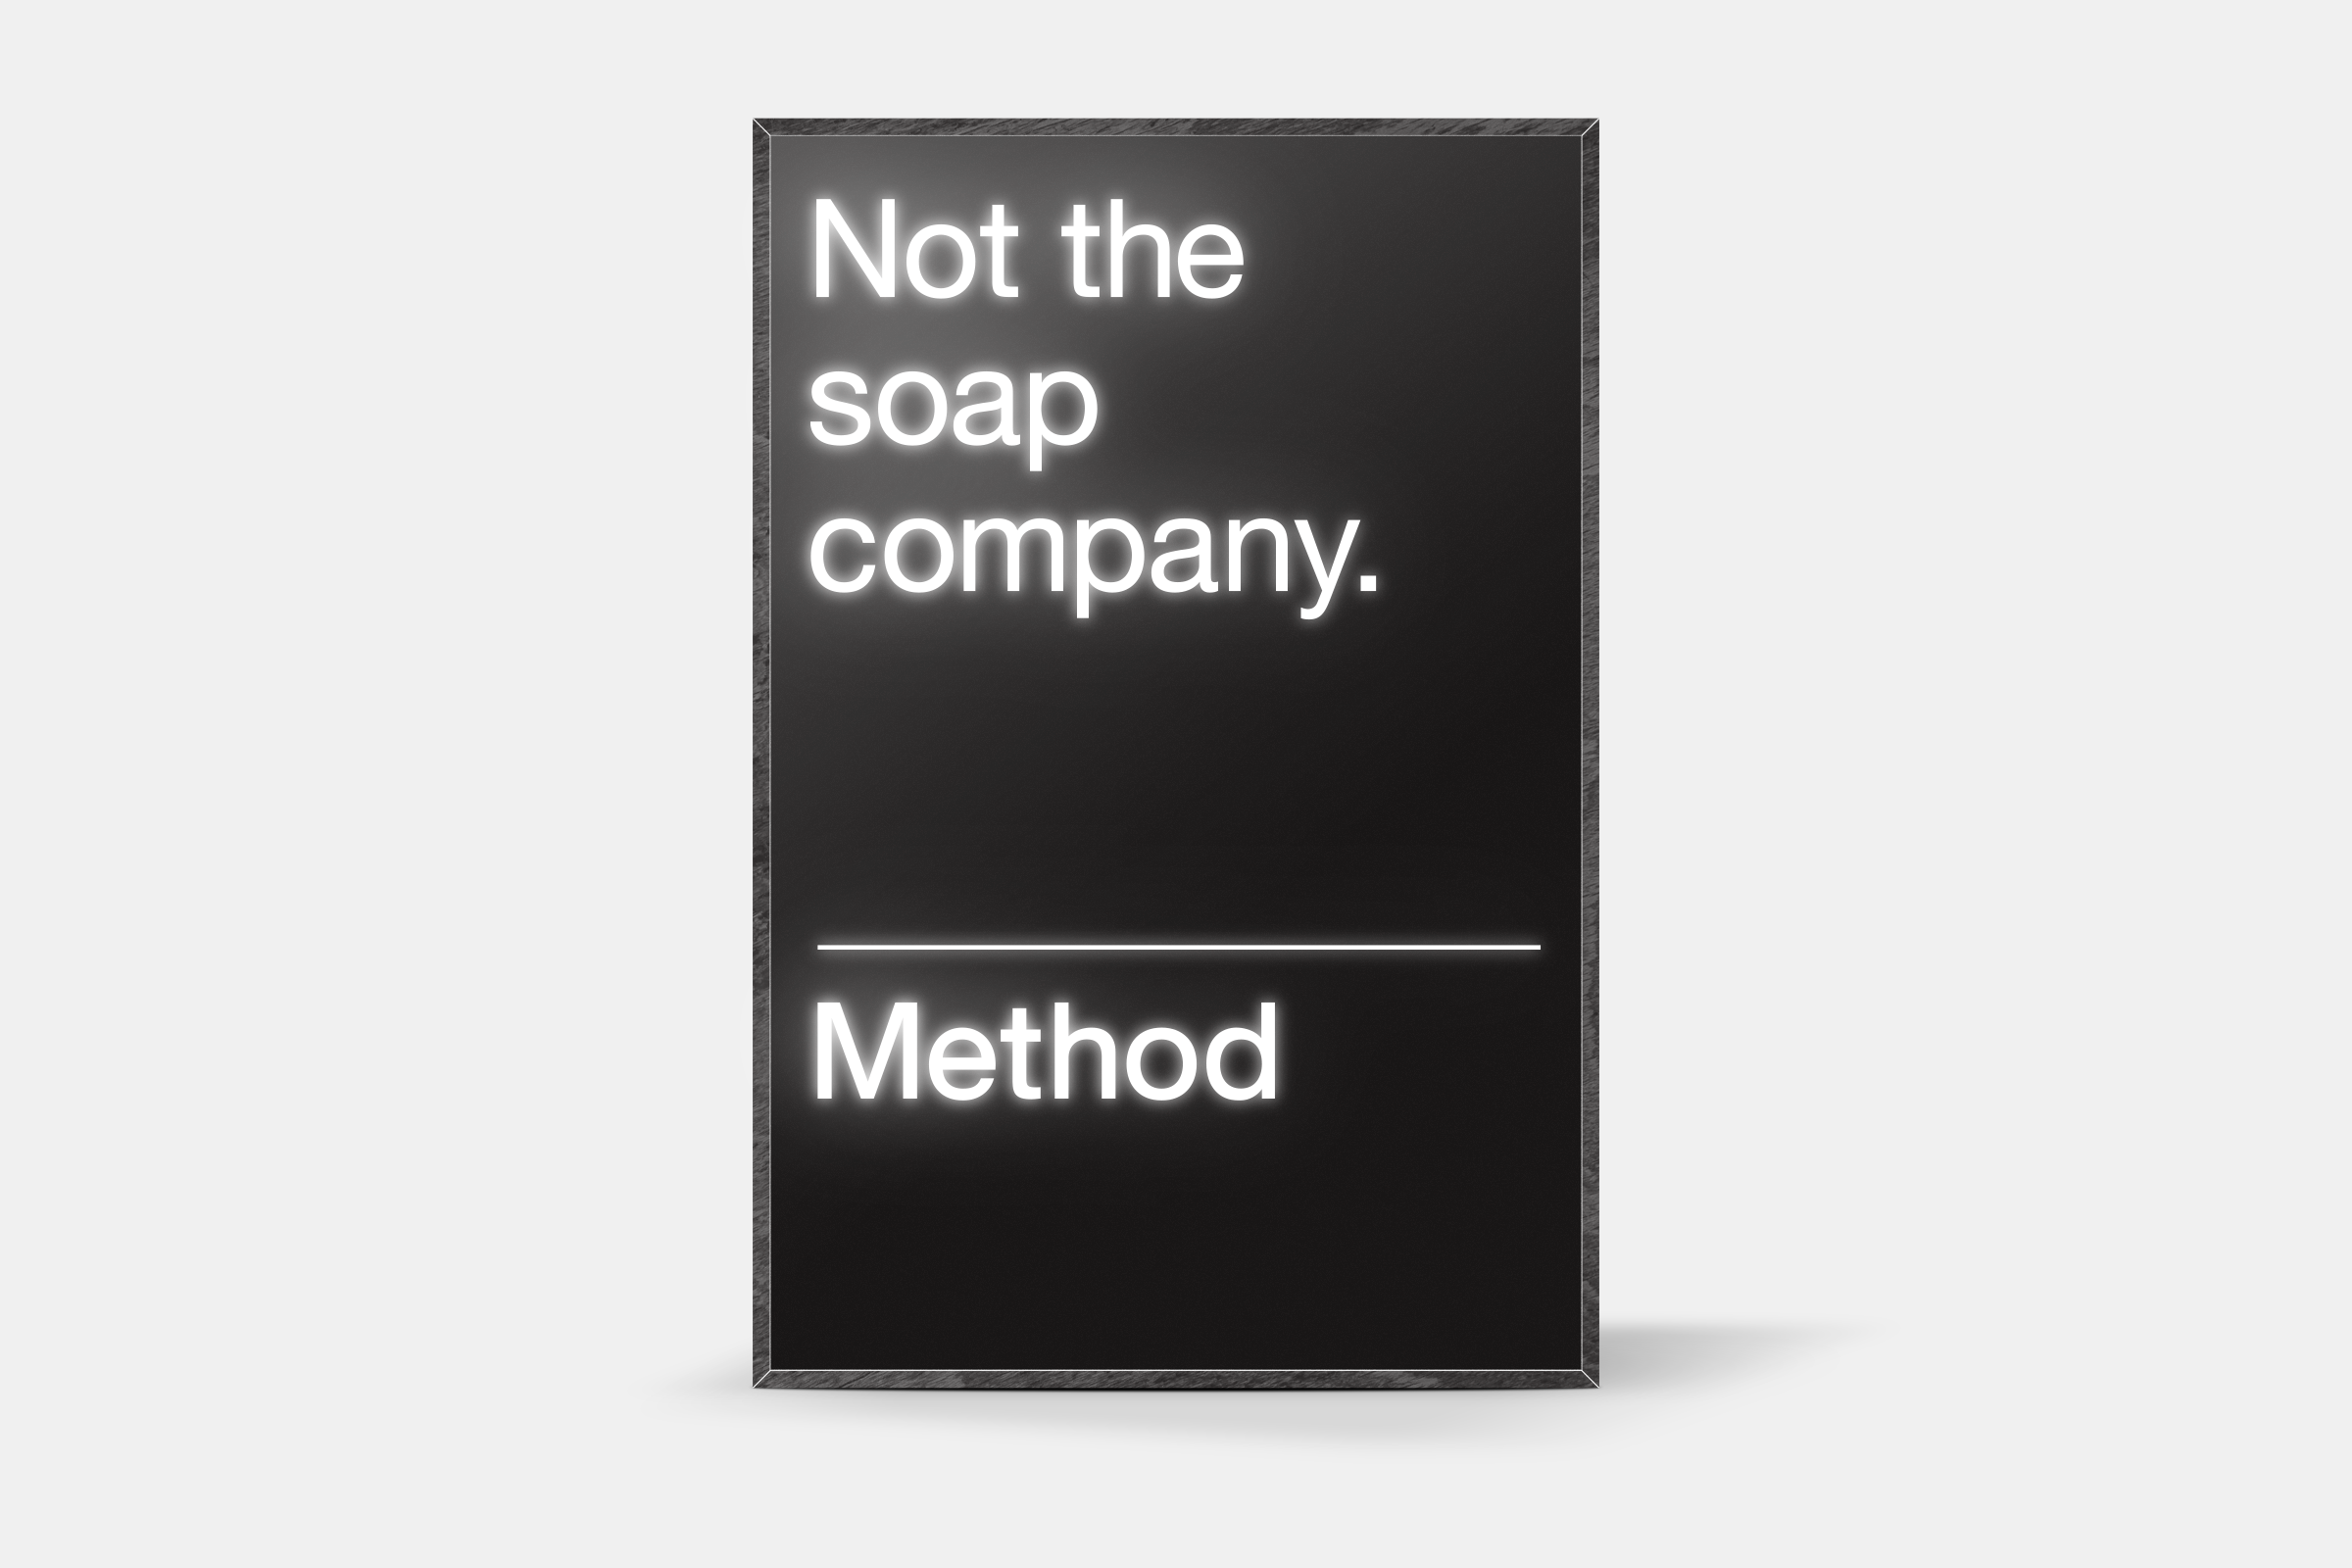 Method, lightbox, 2014